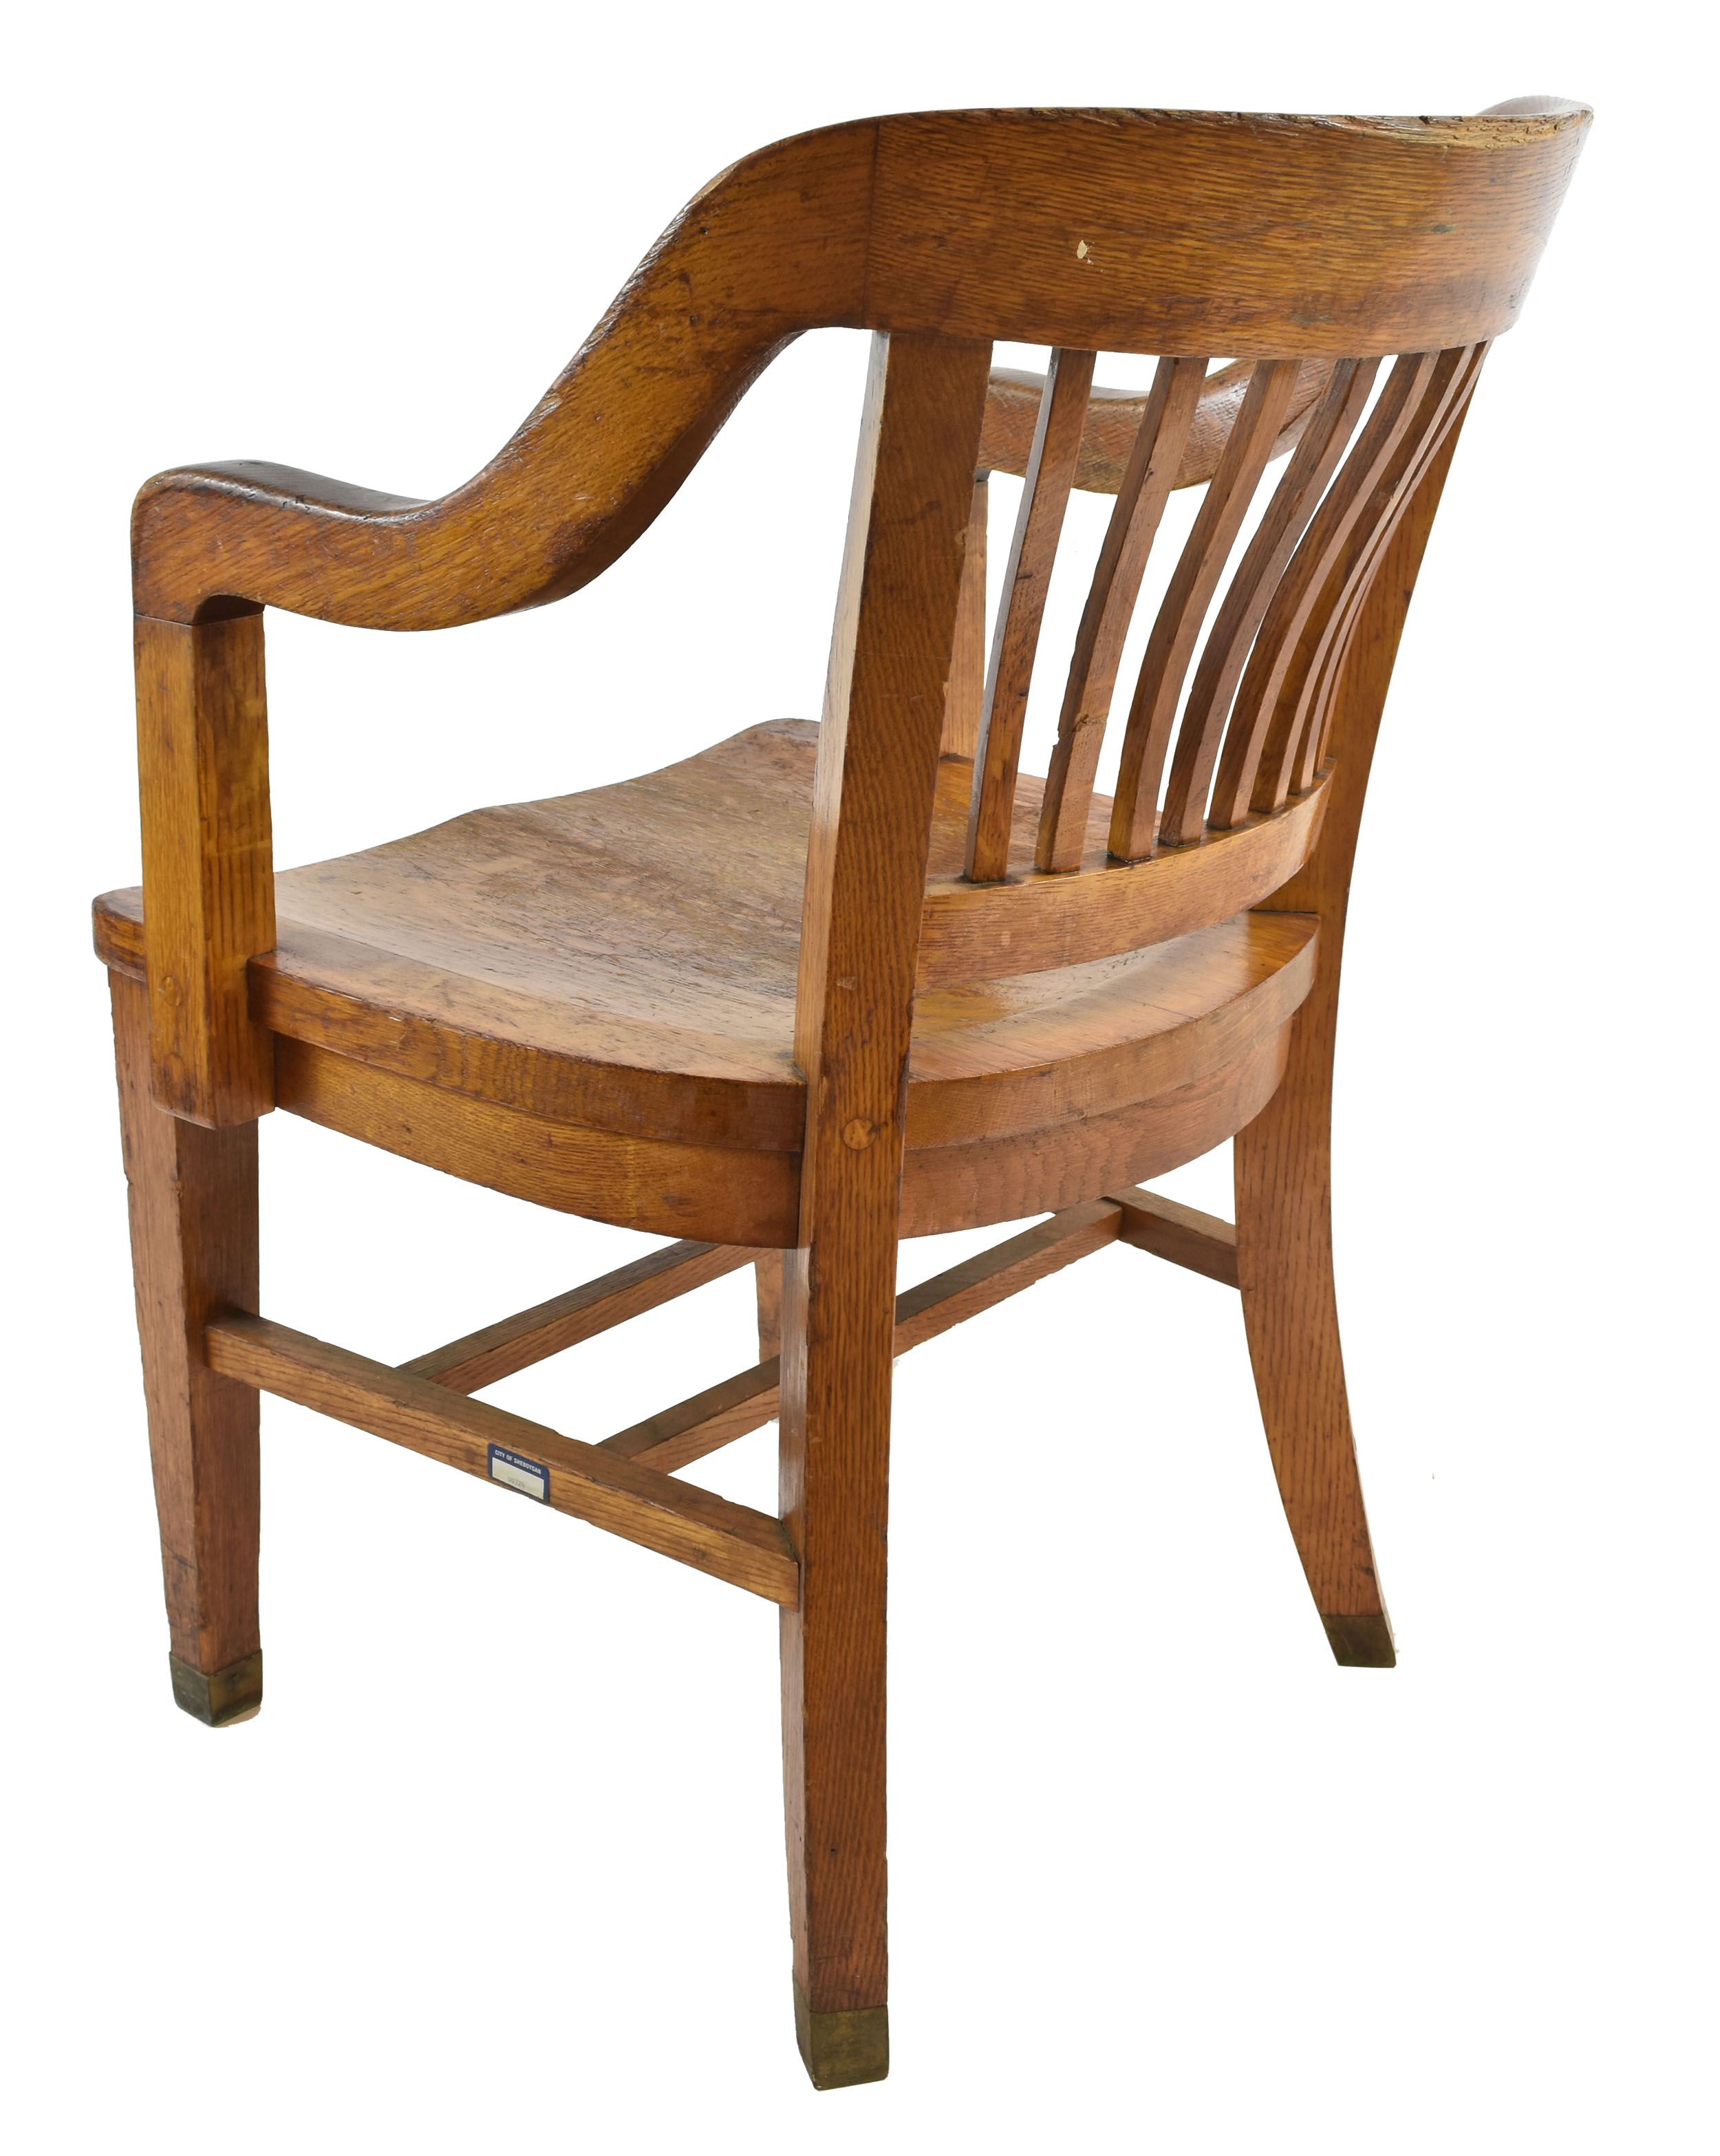 47978 courtroom oak chairs.jpg